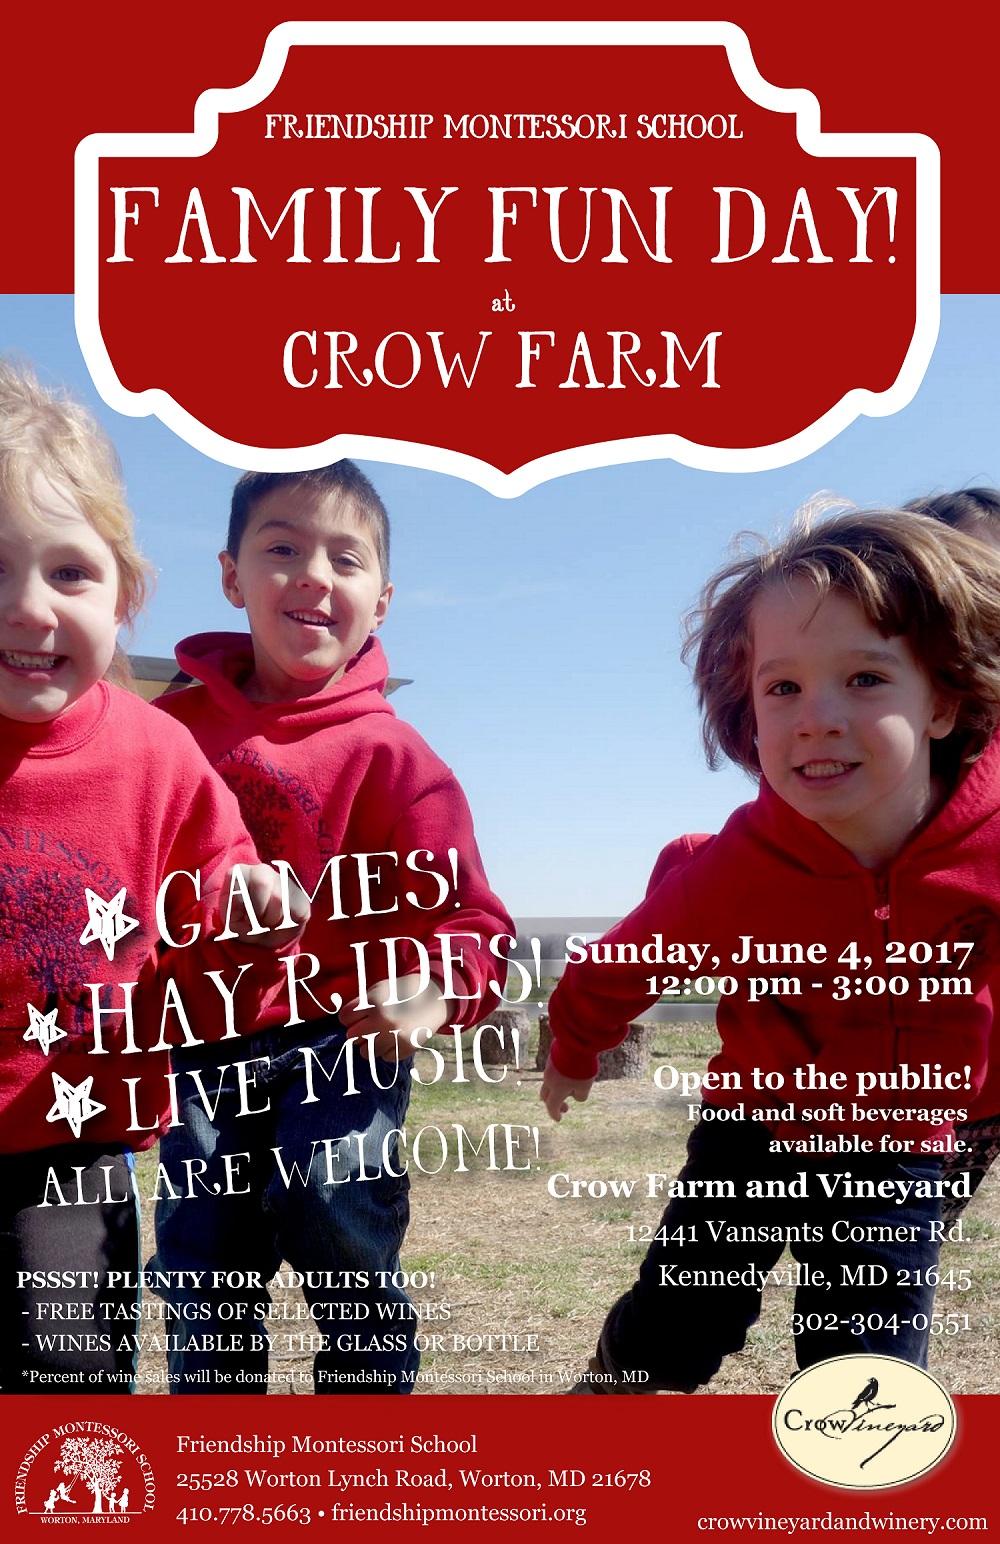 Family Fun Day at Crow Farm